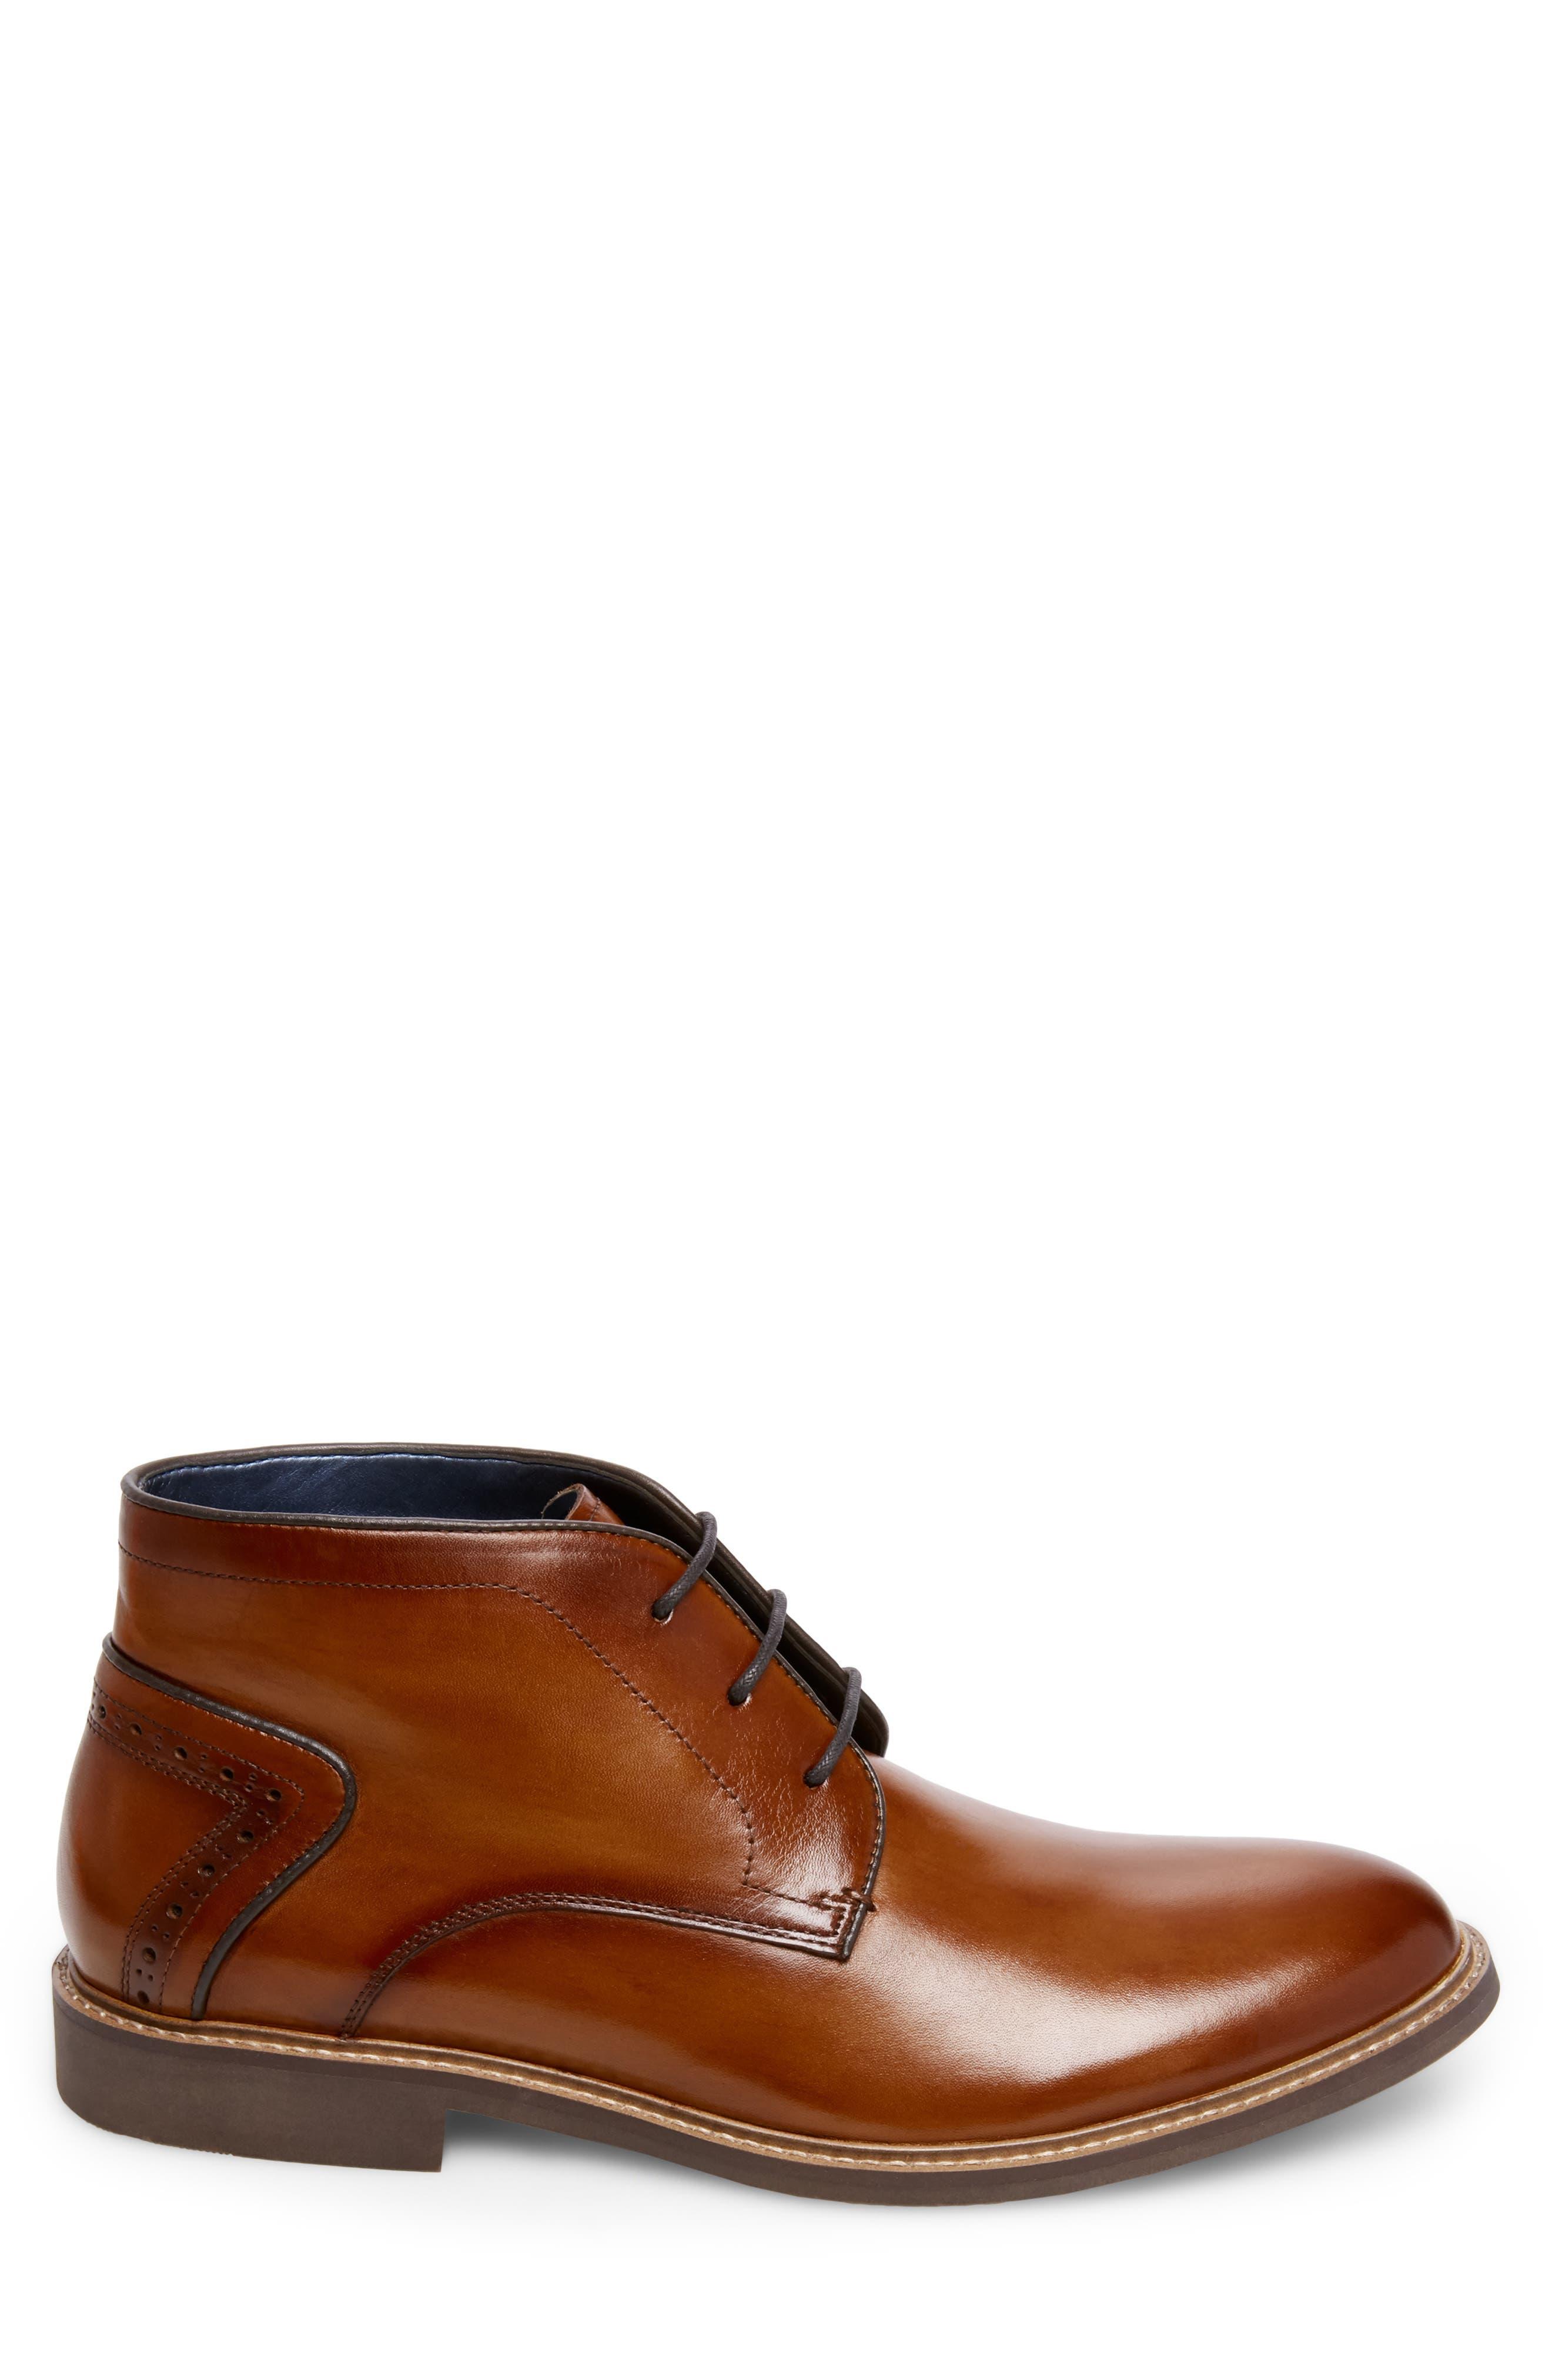 Backster Plain Toe Chukka Boot,                             Alternate thumbnail 3, color,                             COGNAC LEATHER